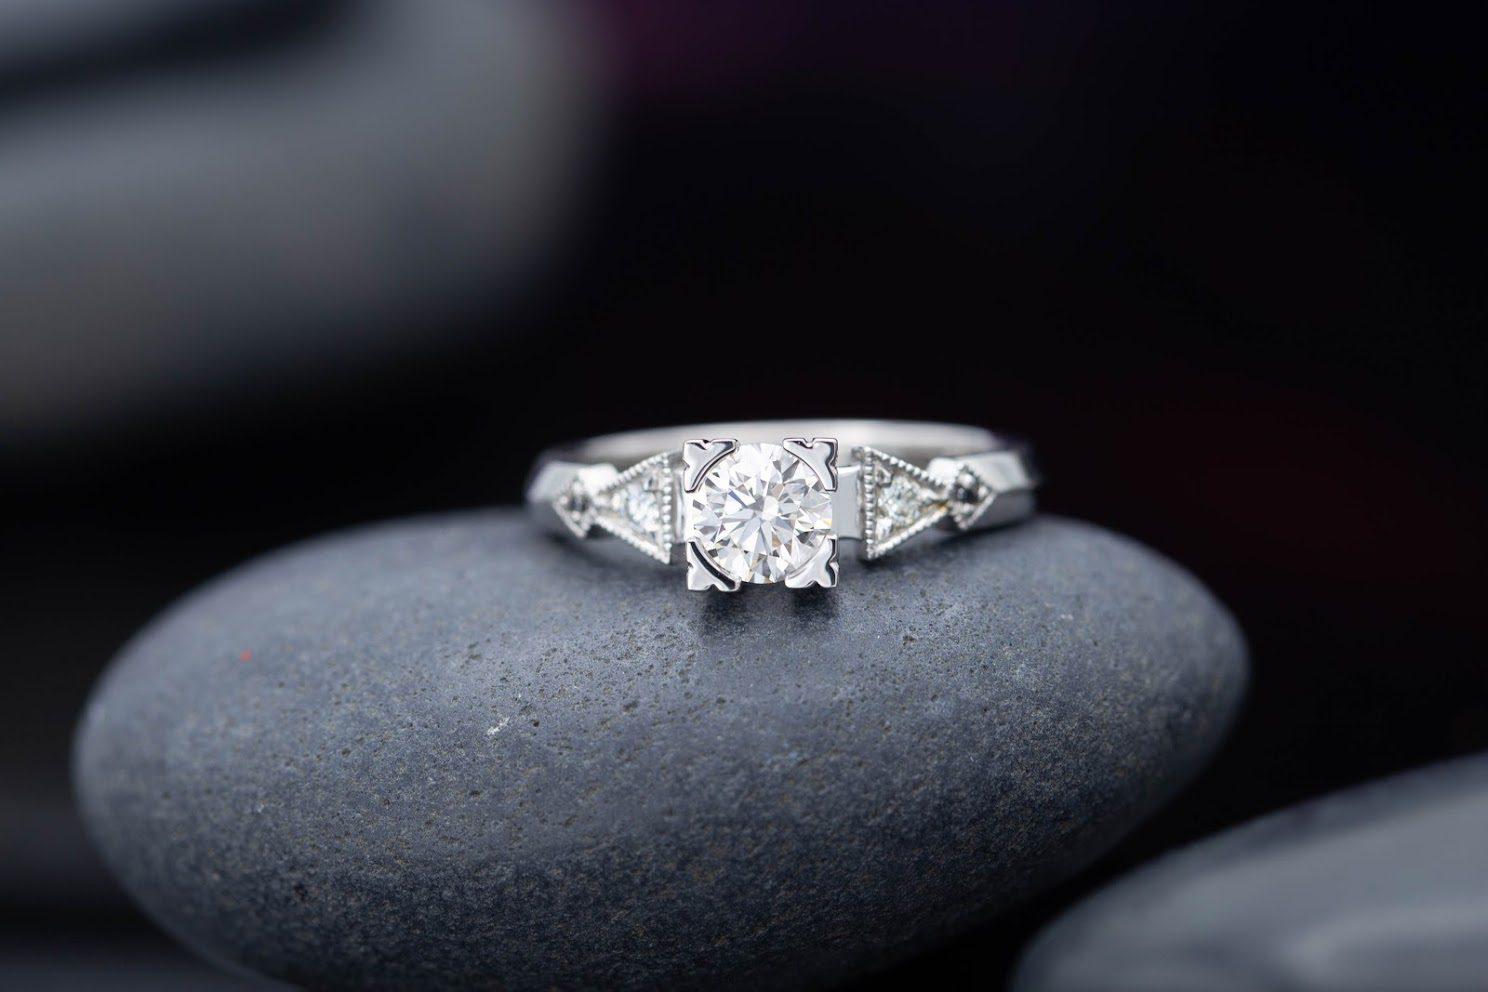 art deco style - engagement ring setting